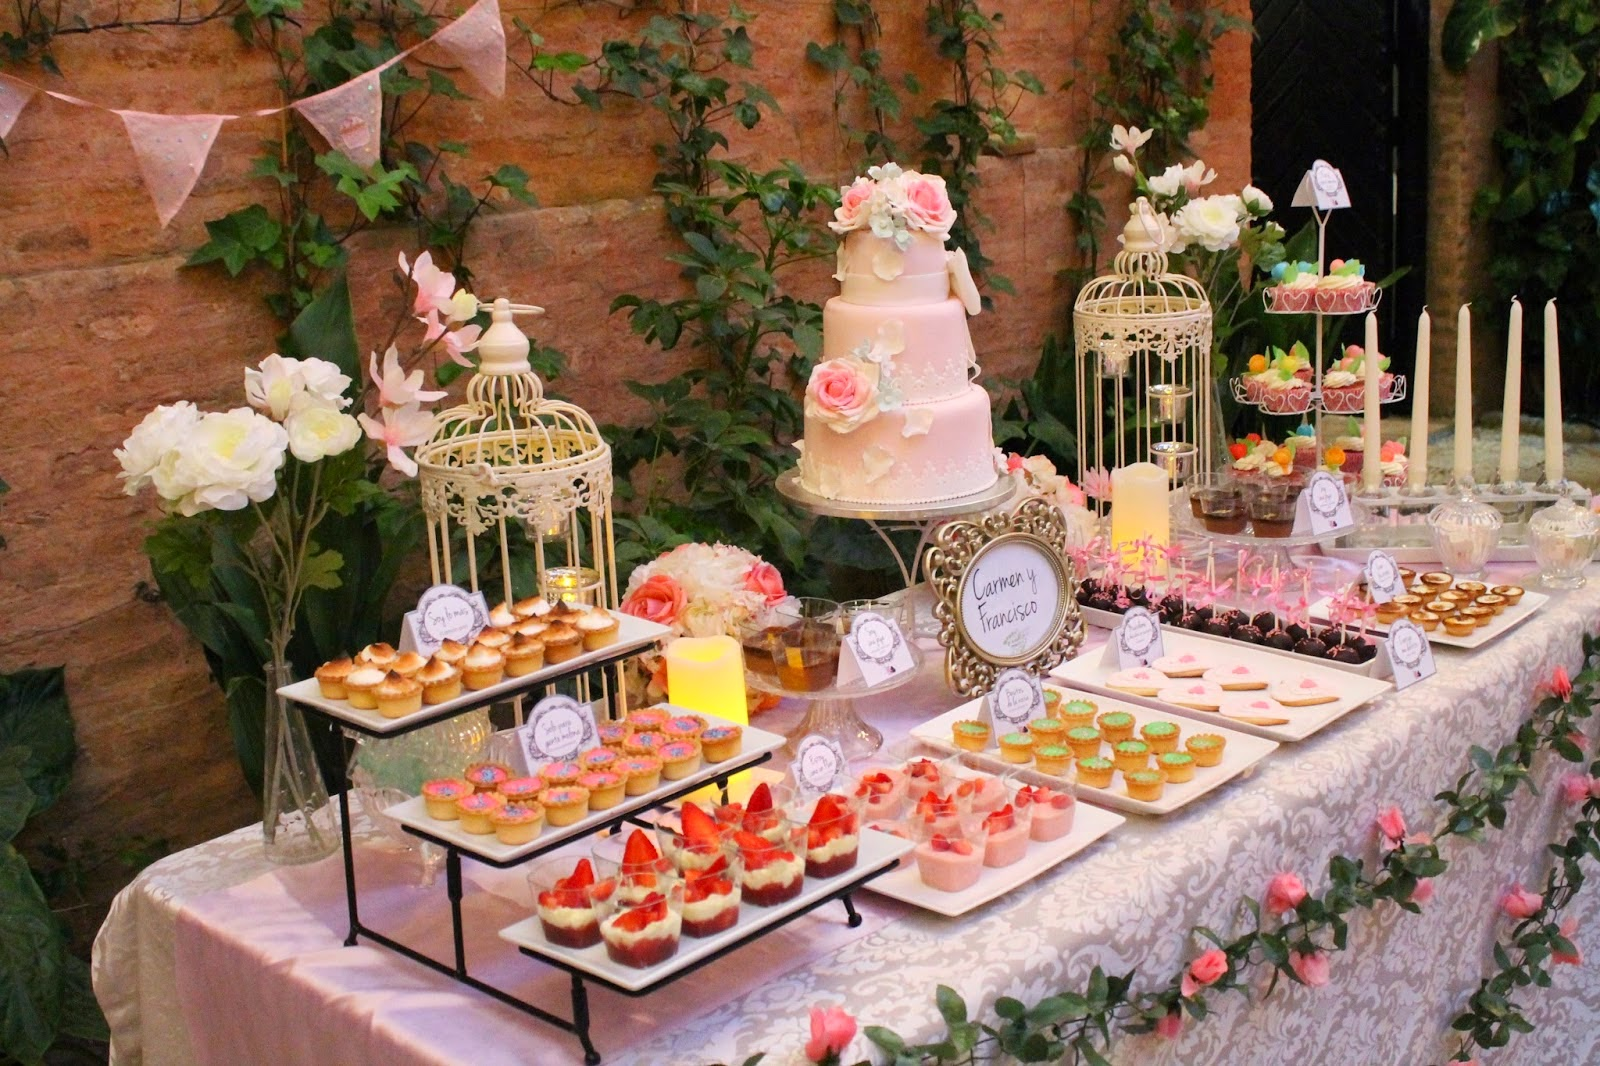 Presentaci n de mesas dulces - Mesas de decoracion ...